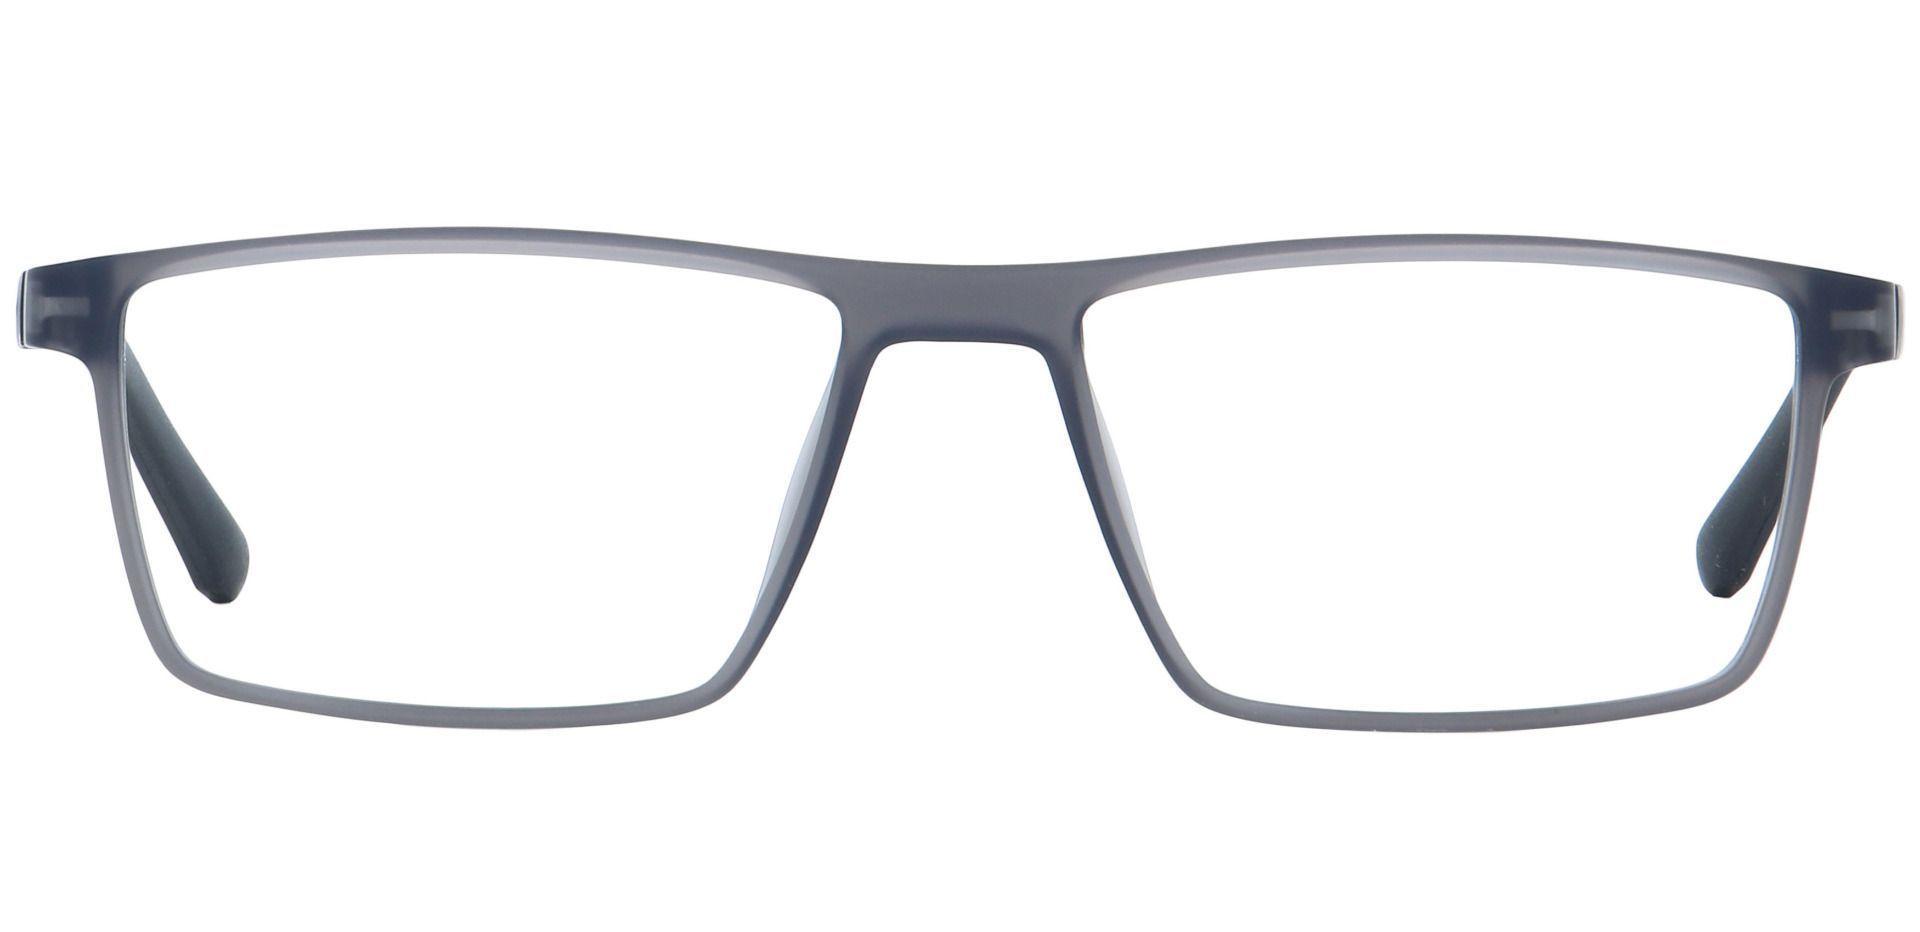 Woolf Rectangle Prescription Glasses - Gray